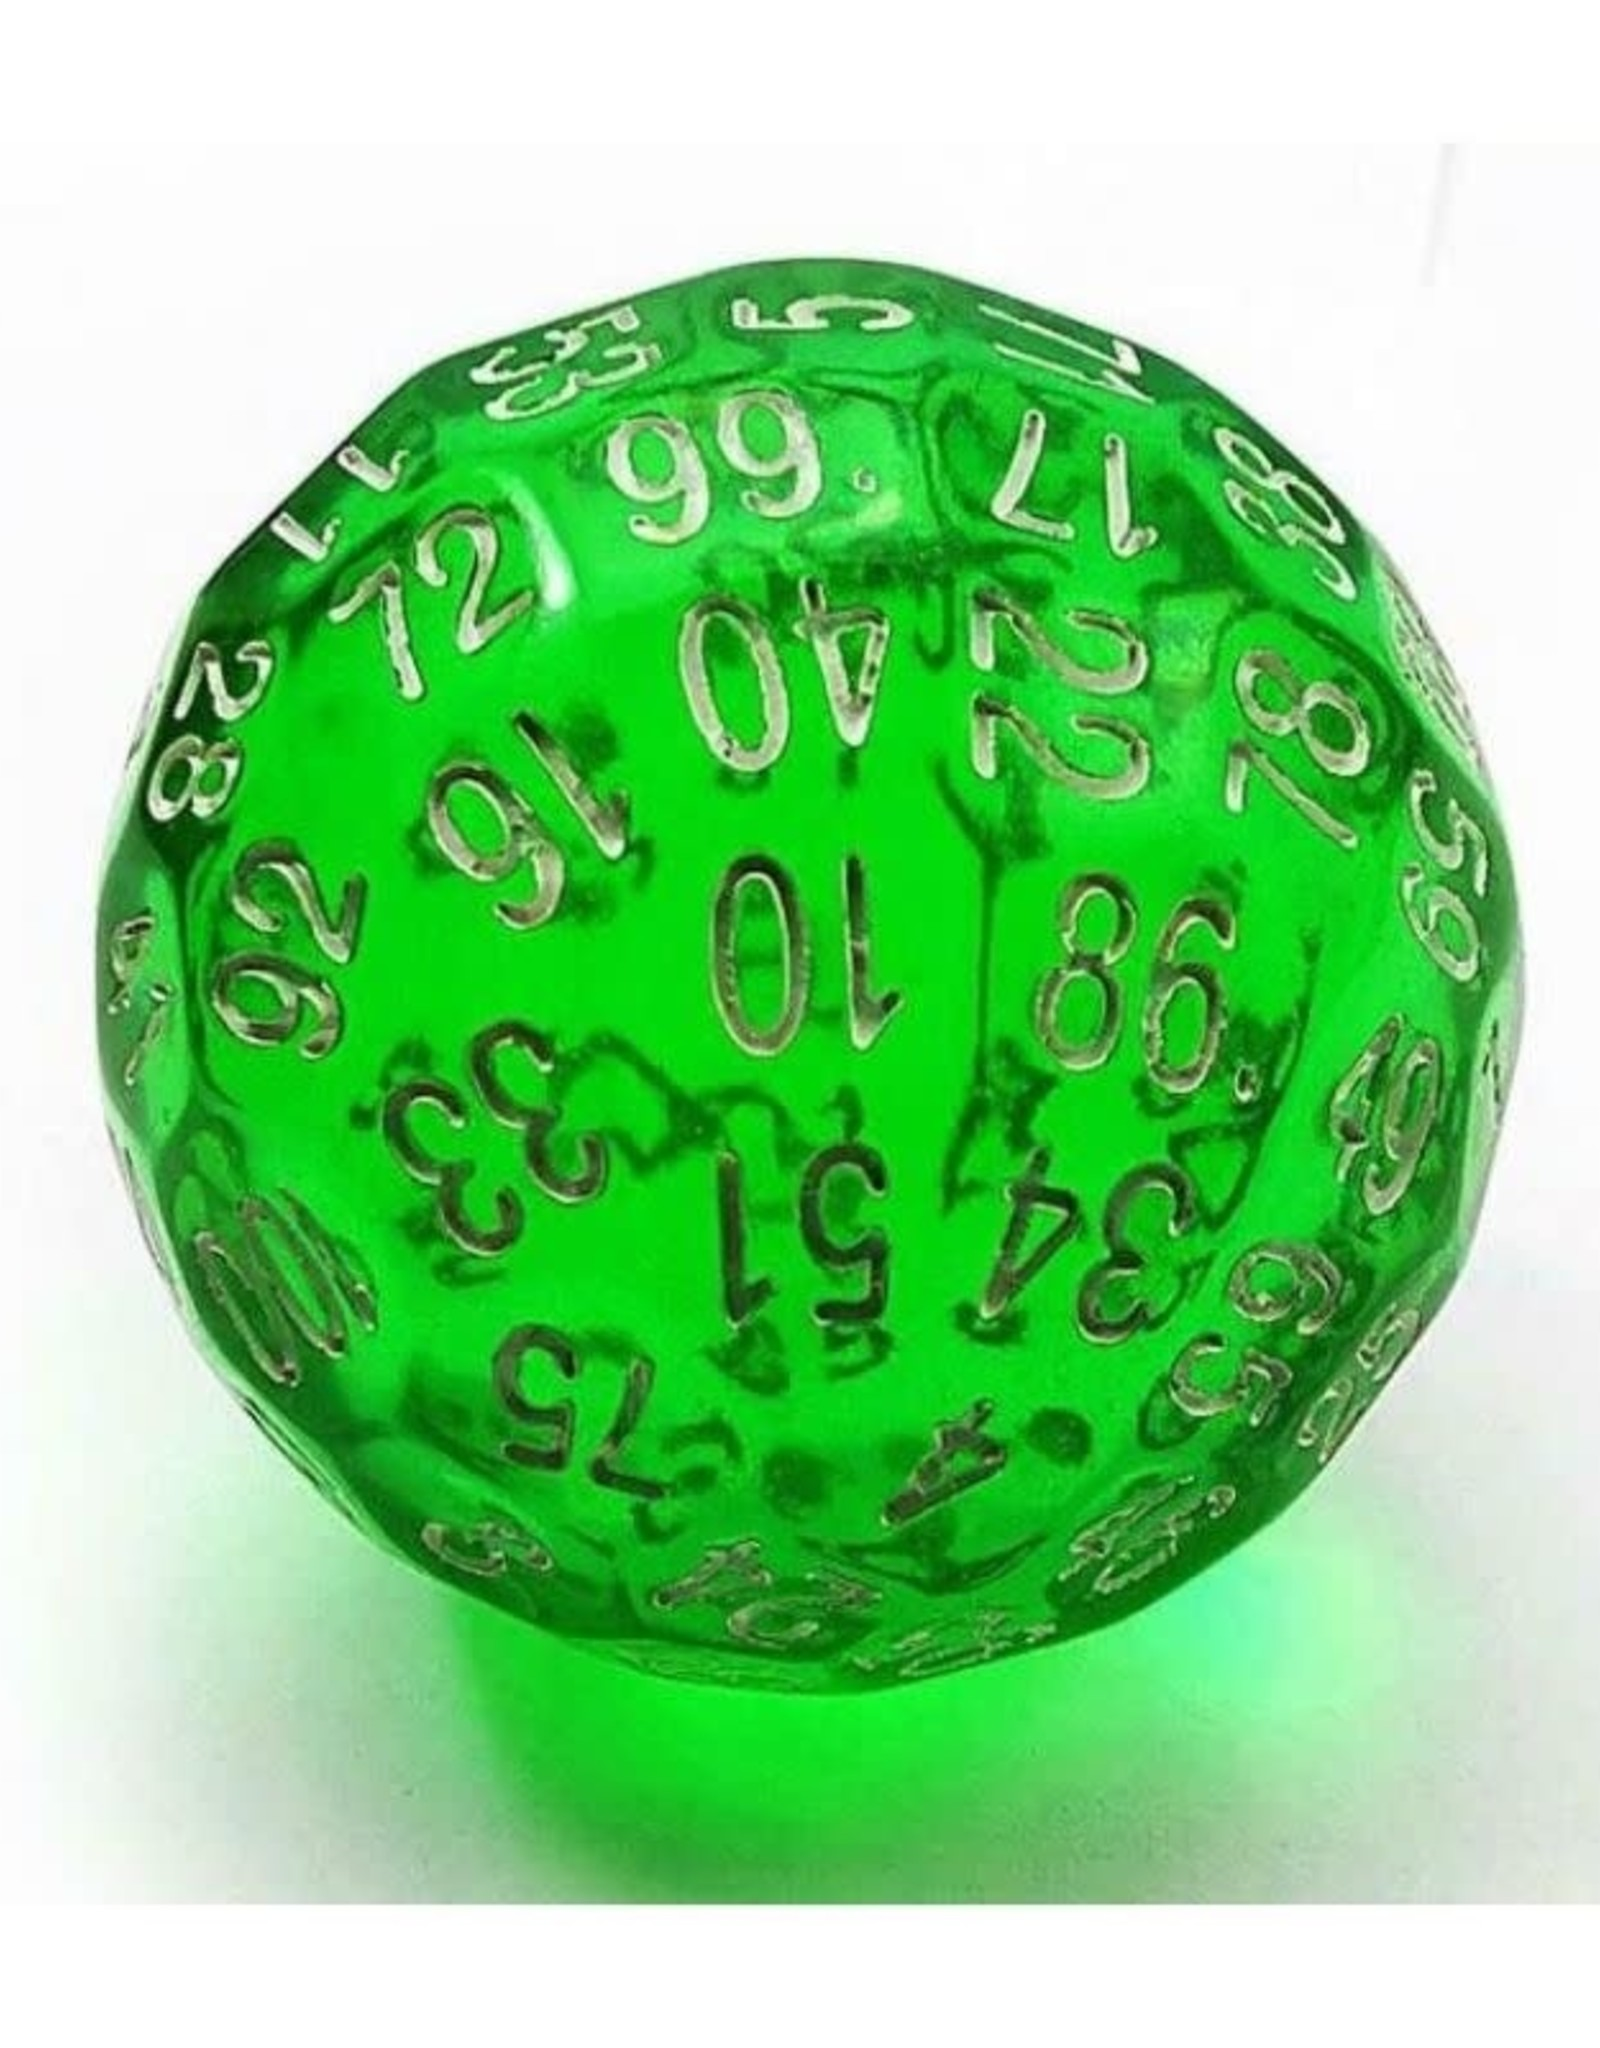 Foam Brain Games 45mm D100 (Translucent Green)